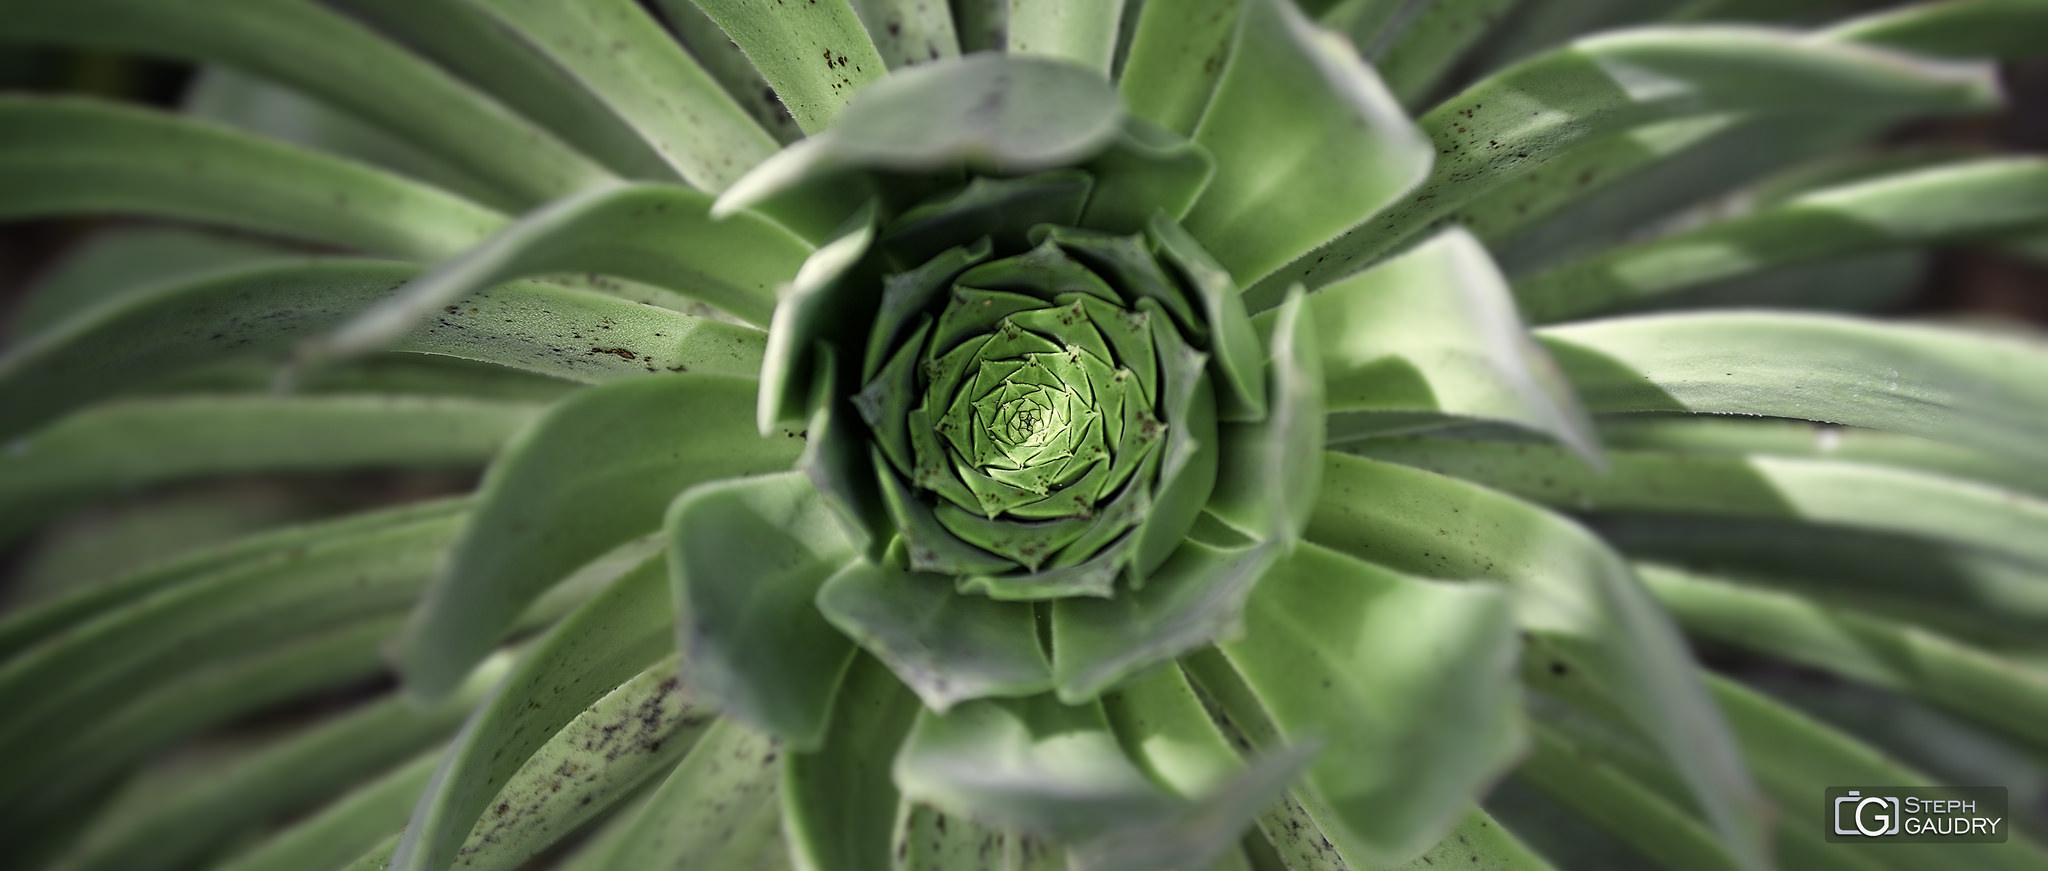 Vortex végétal [Klik om de diavoorstelling te starten]